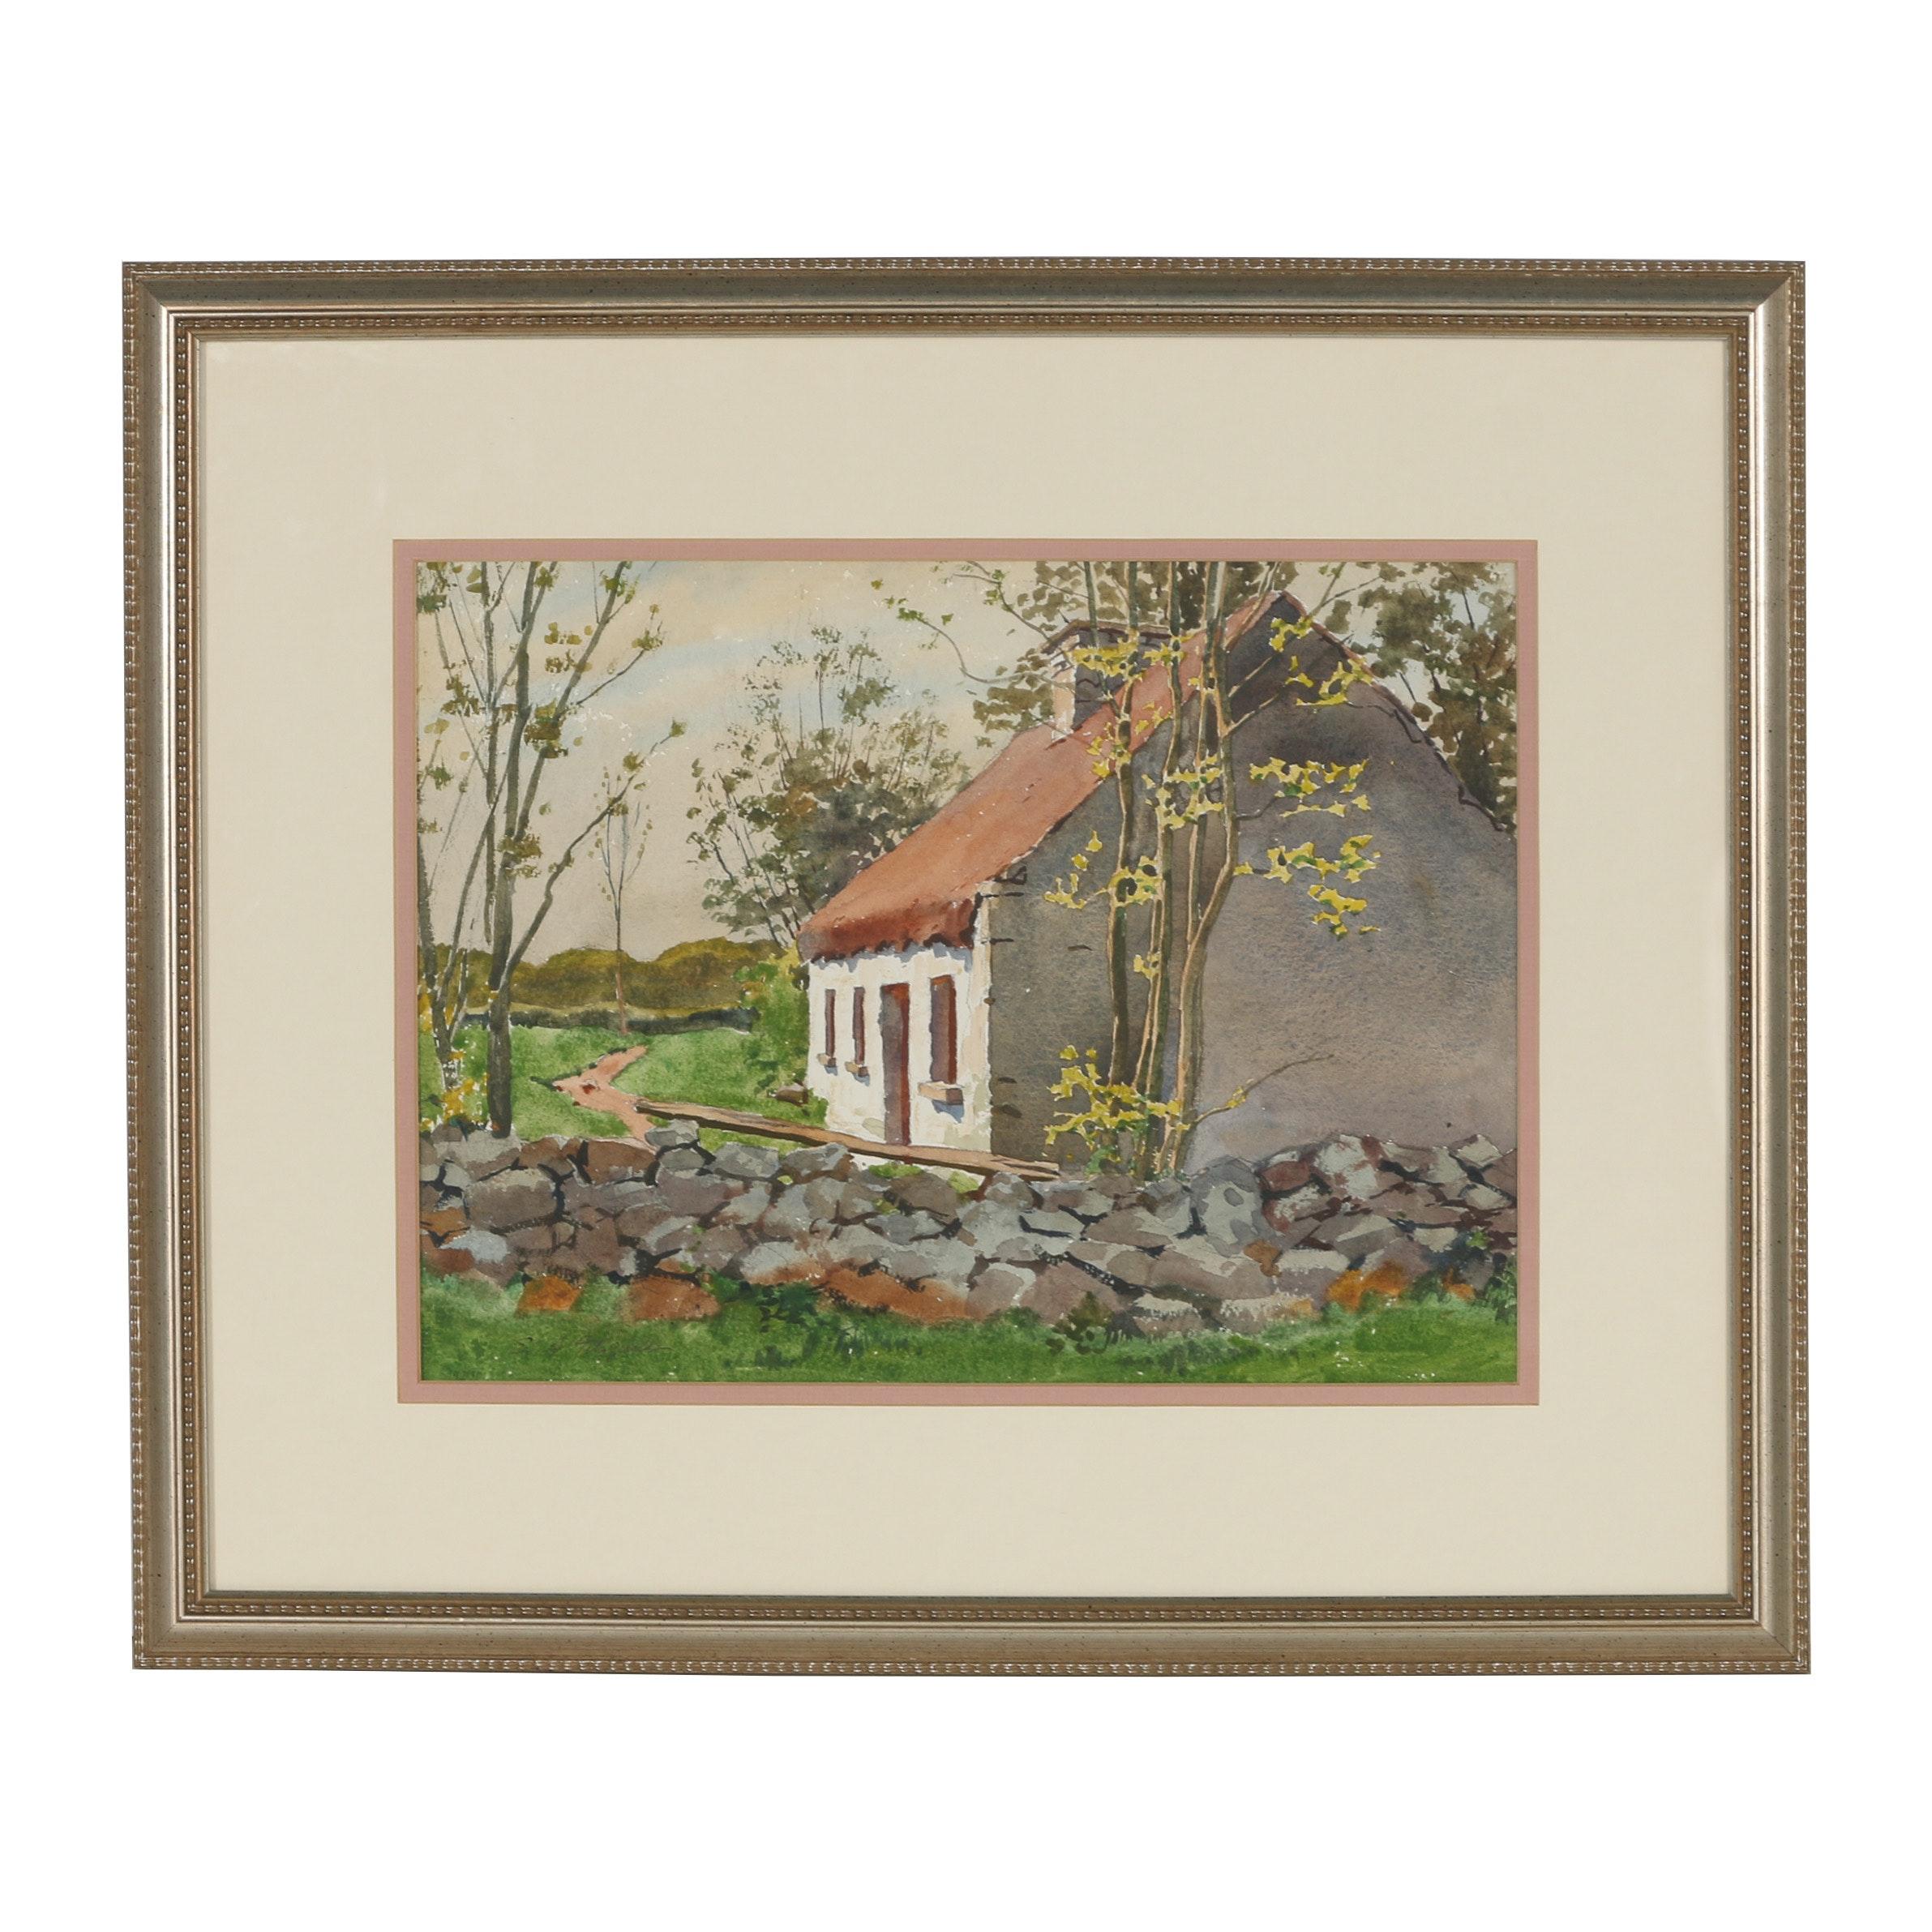 Edmond J. Fitzgerald Watercolor Painting